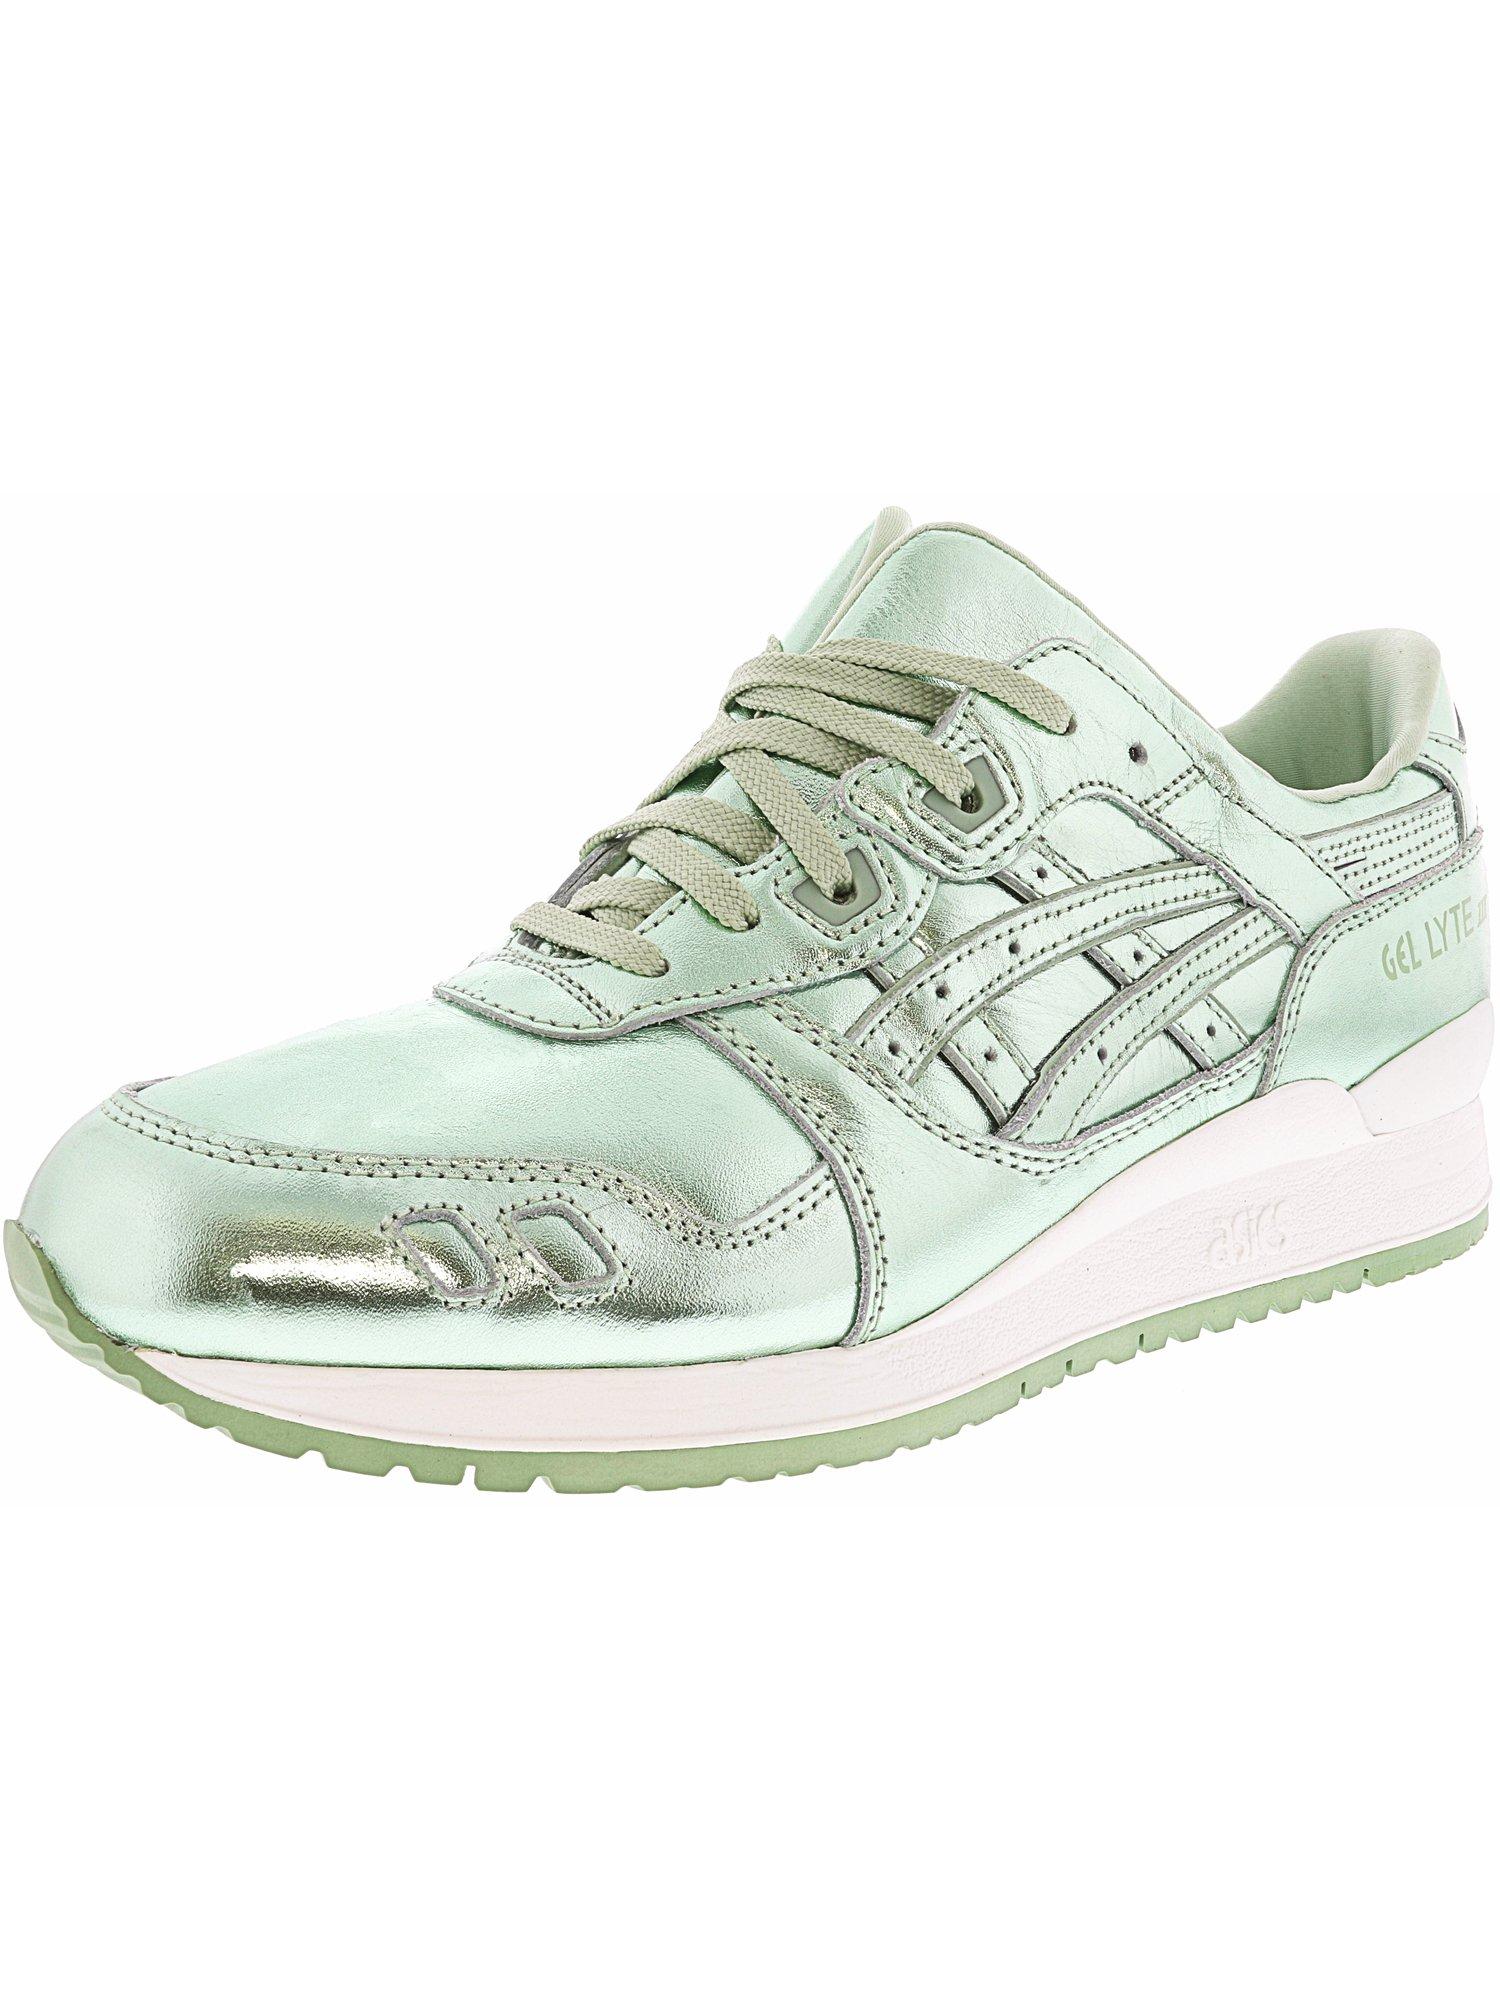 Women's Gel-Lyte 3 Green / Ankle-High Running Shoe - 10M